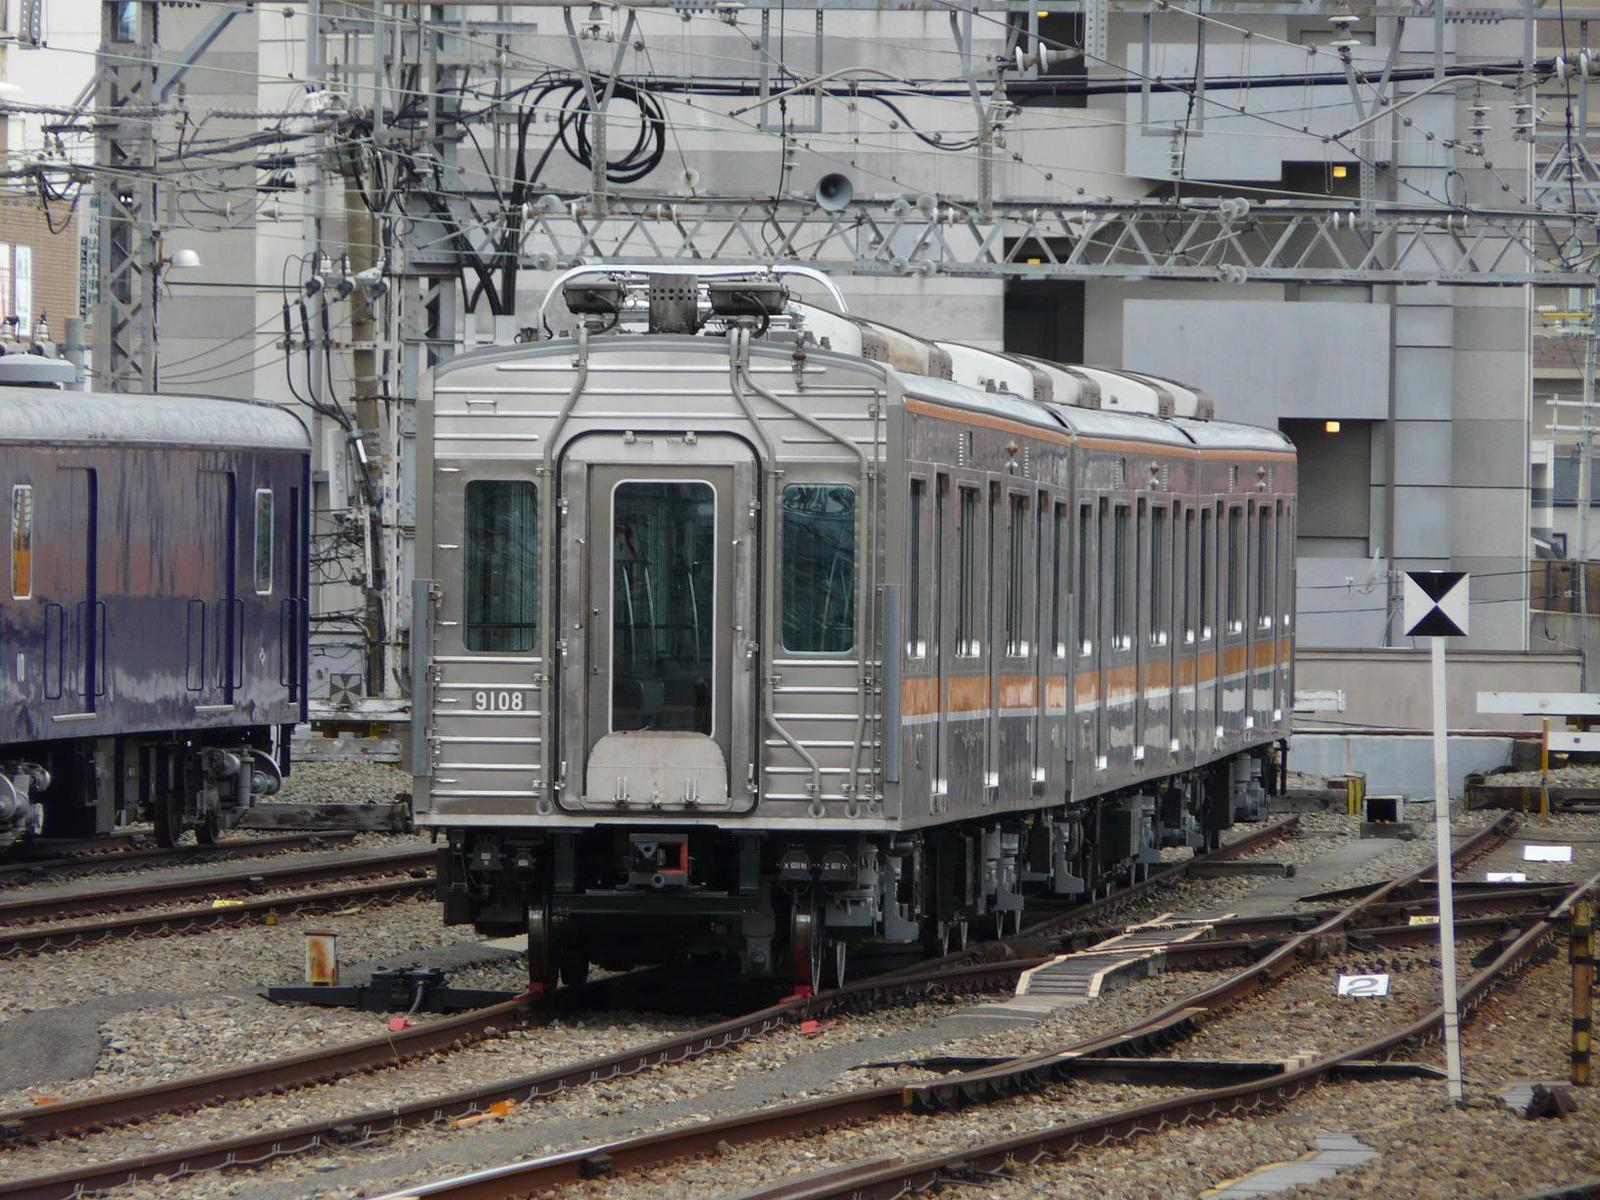 P1170022